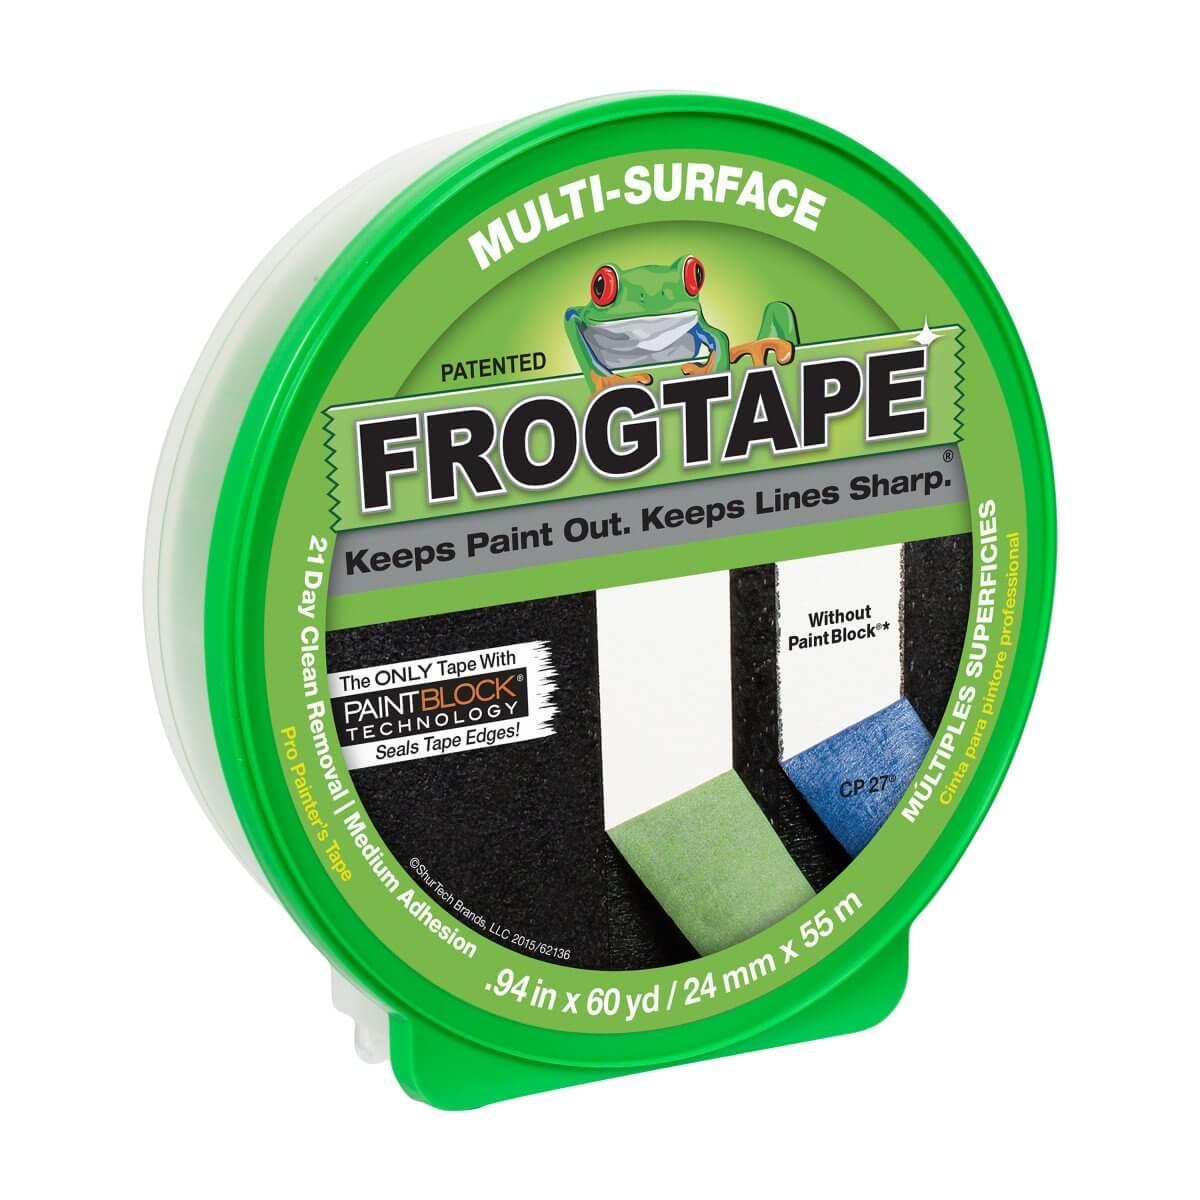 Frogtape Painter's Tape